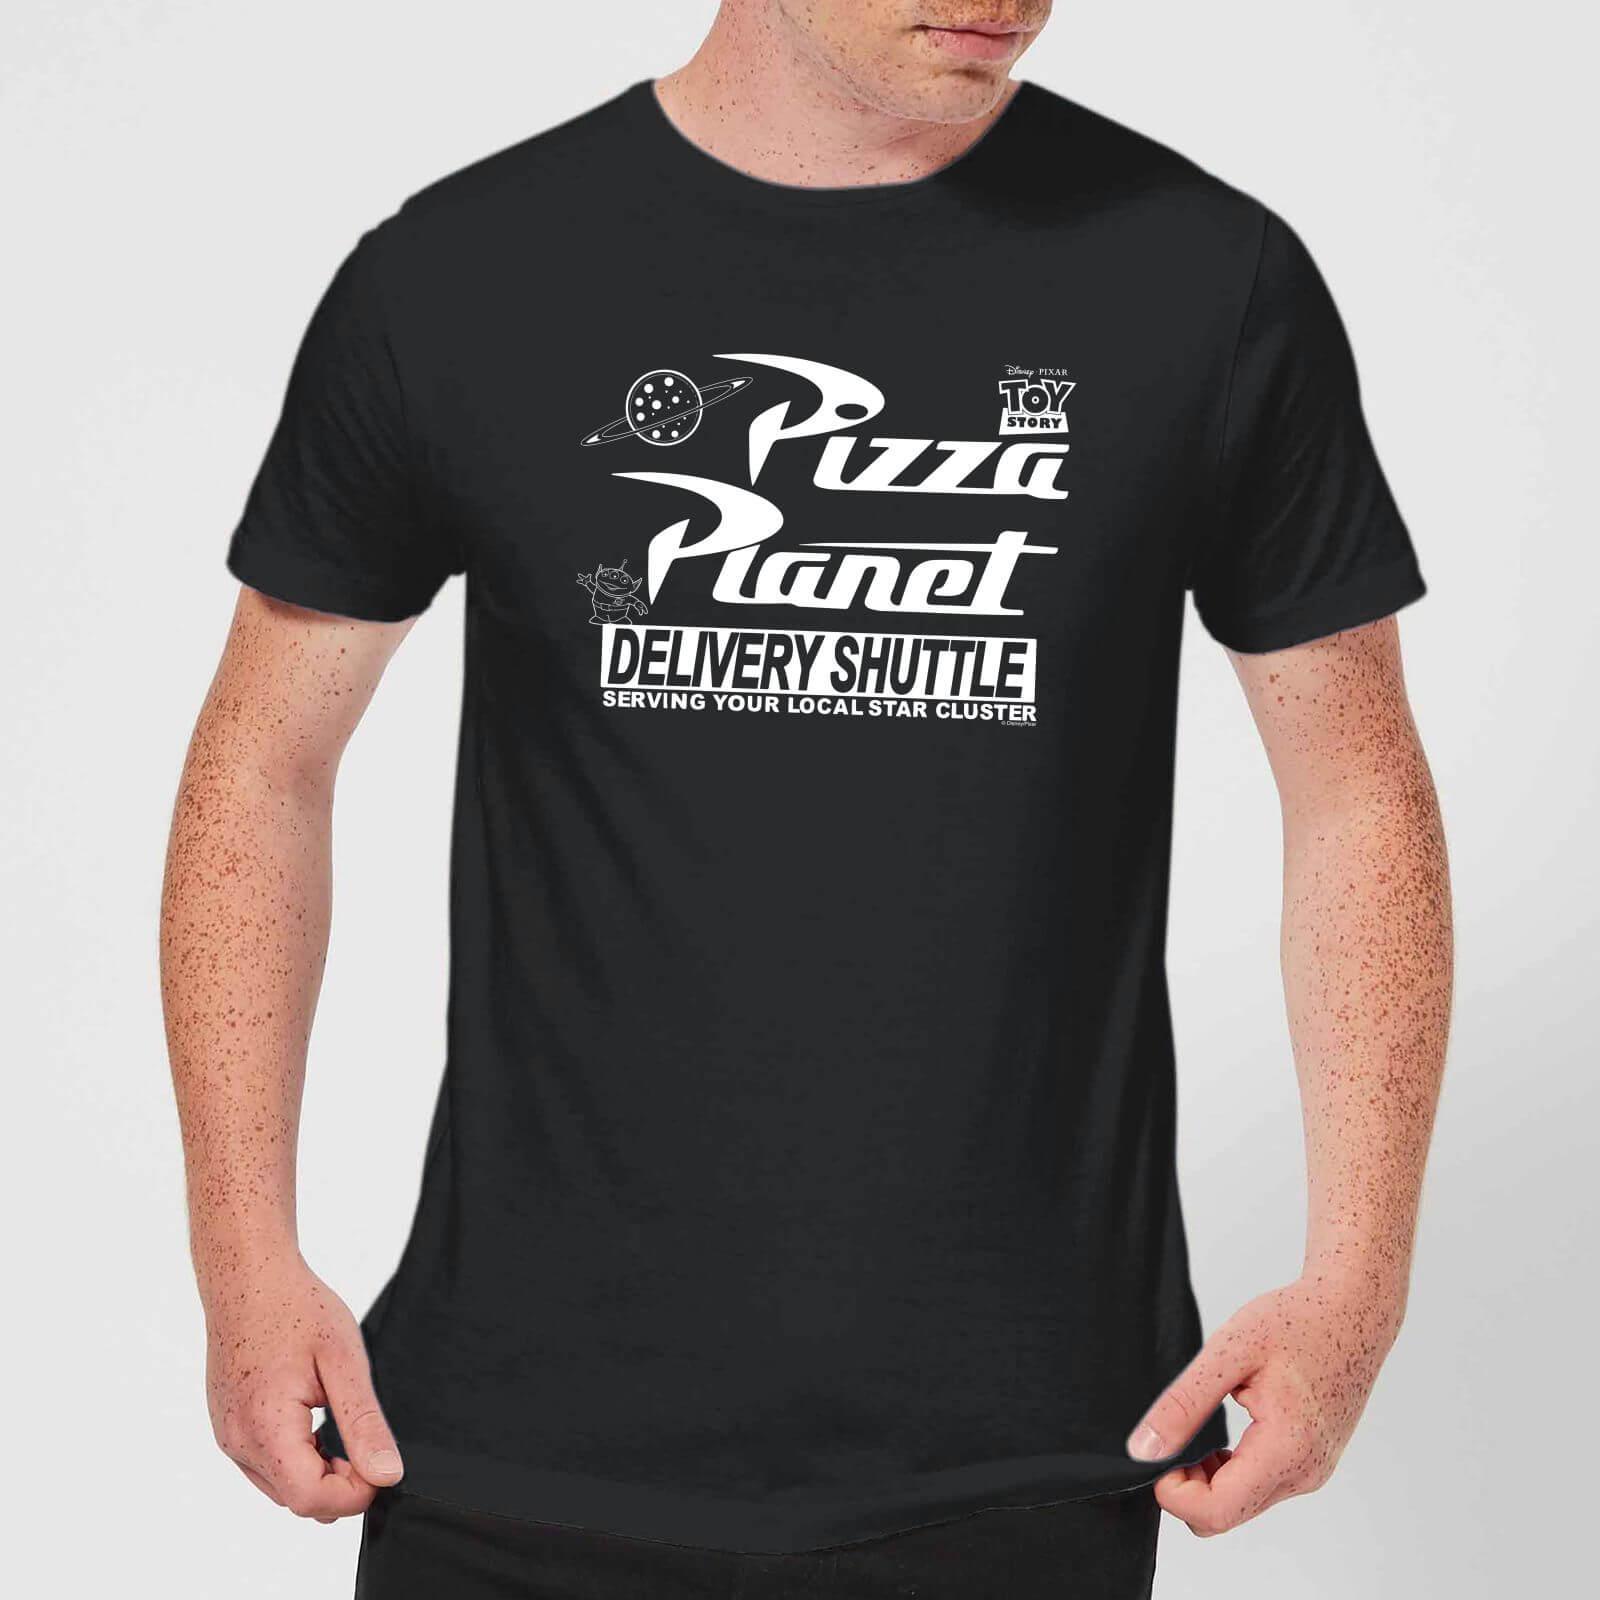 Toy Story Pizza Planet Logo Men's T-Shirt - Black - M - Nero